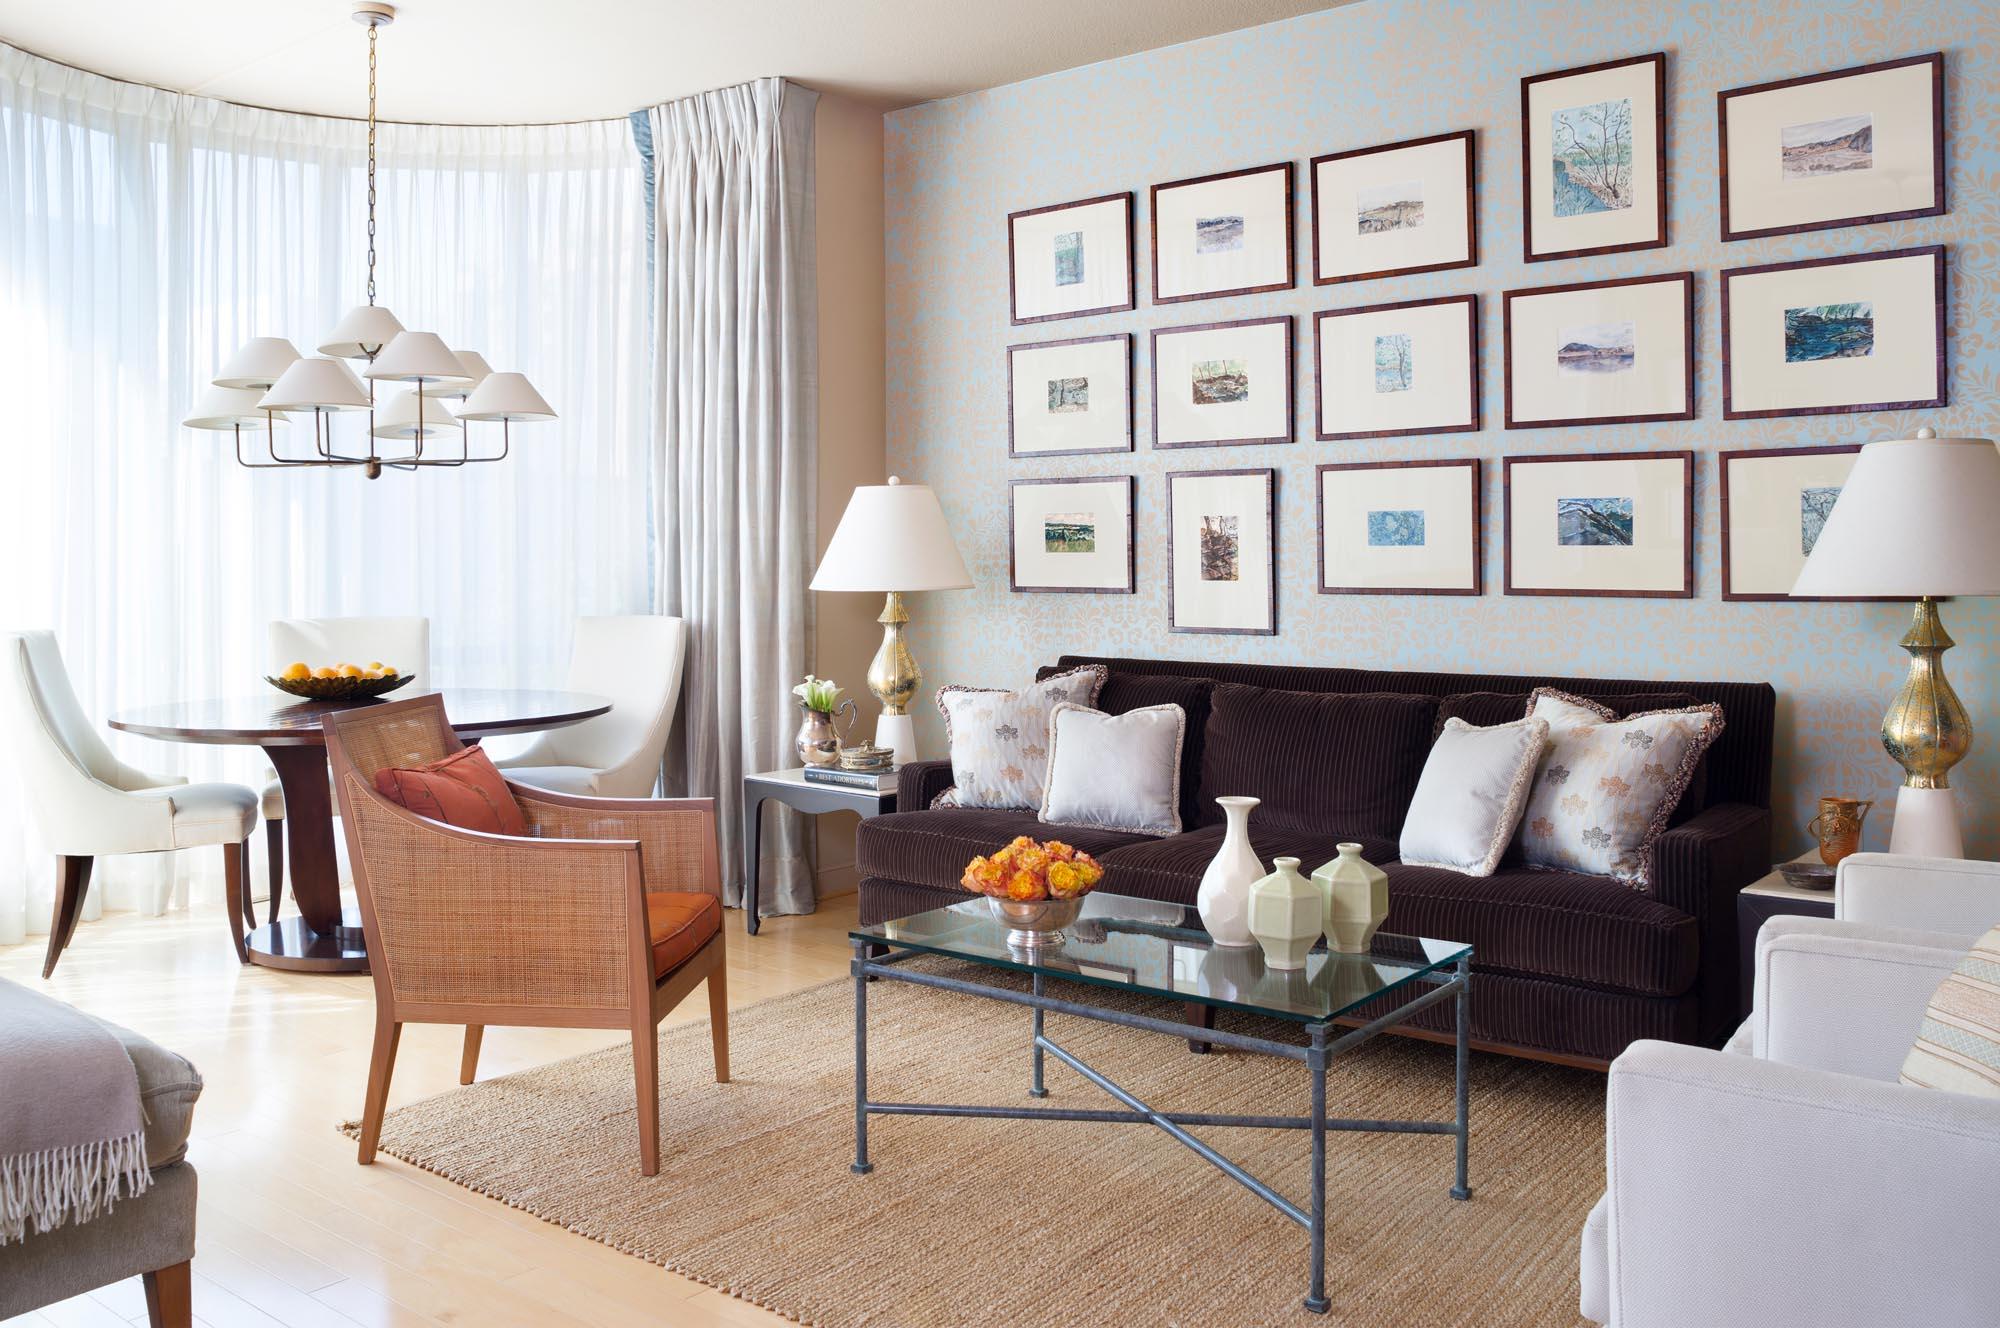 Dupont High Rise - Interior design in Boston by Dane Austin Design